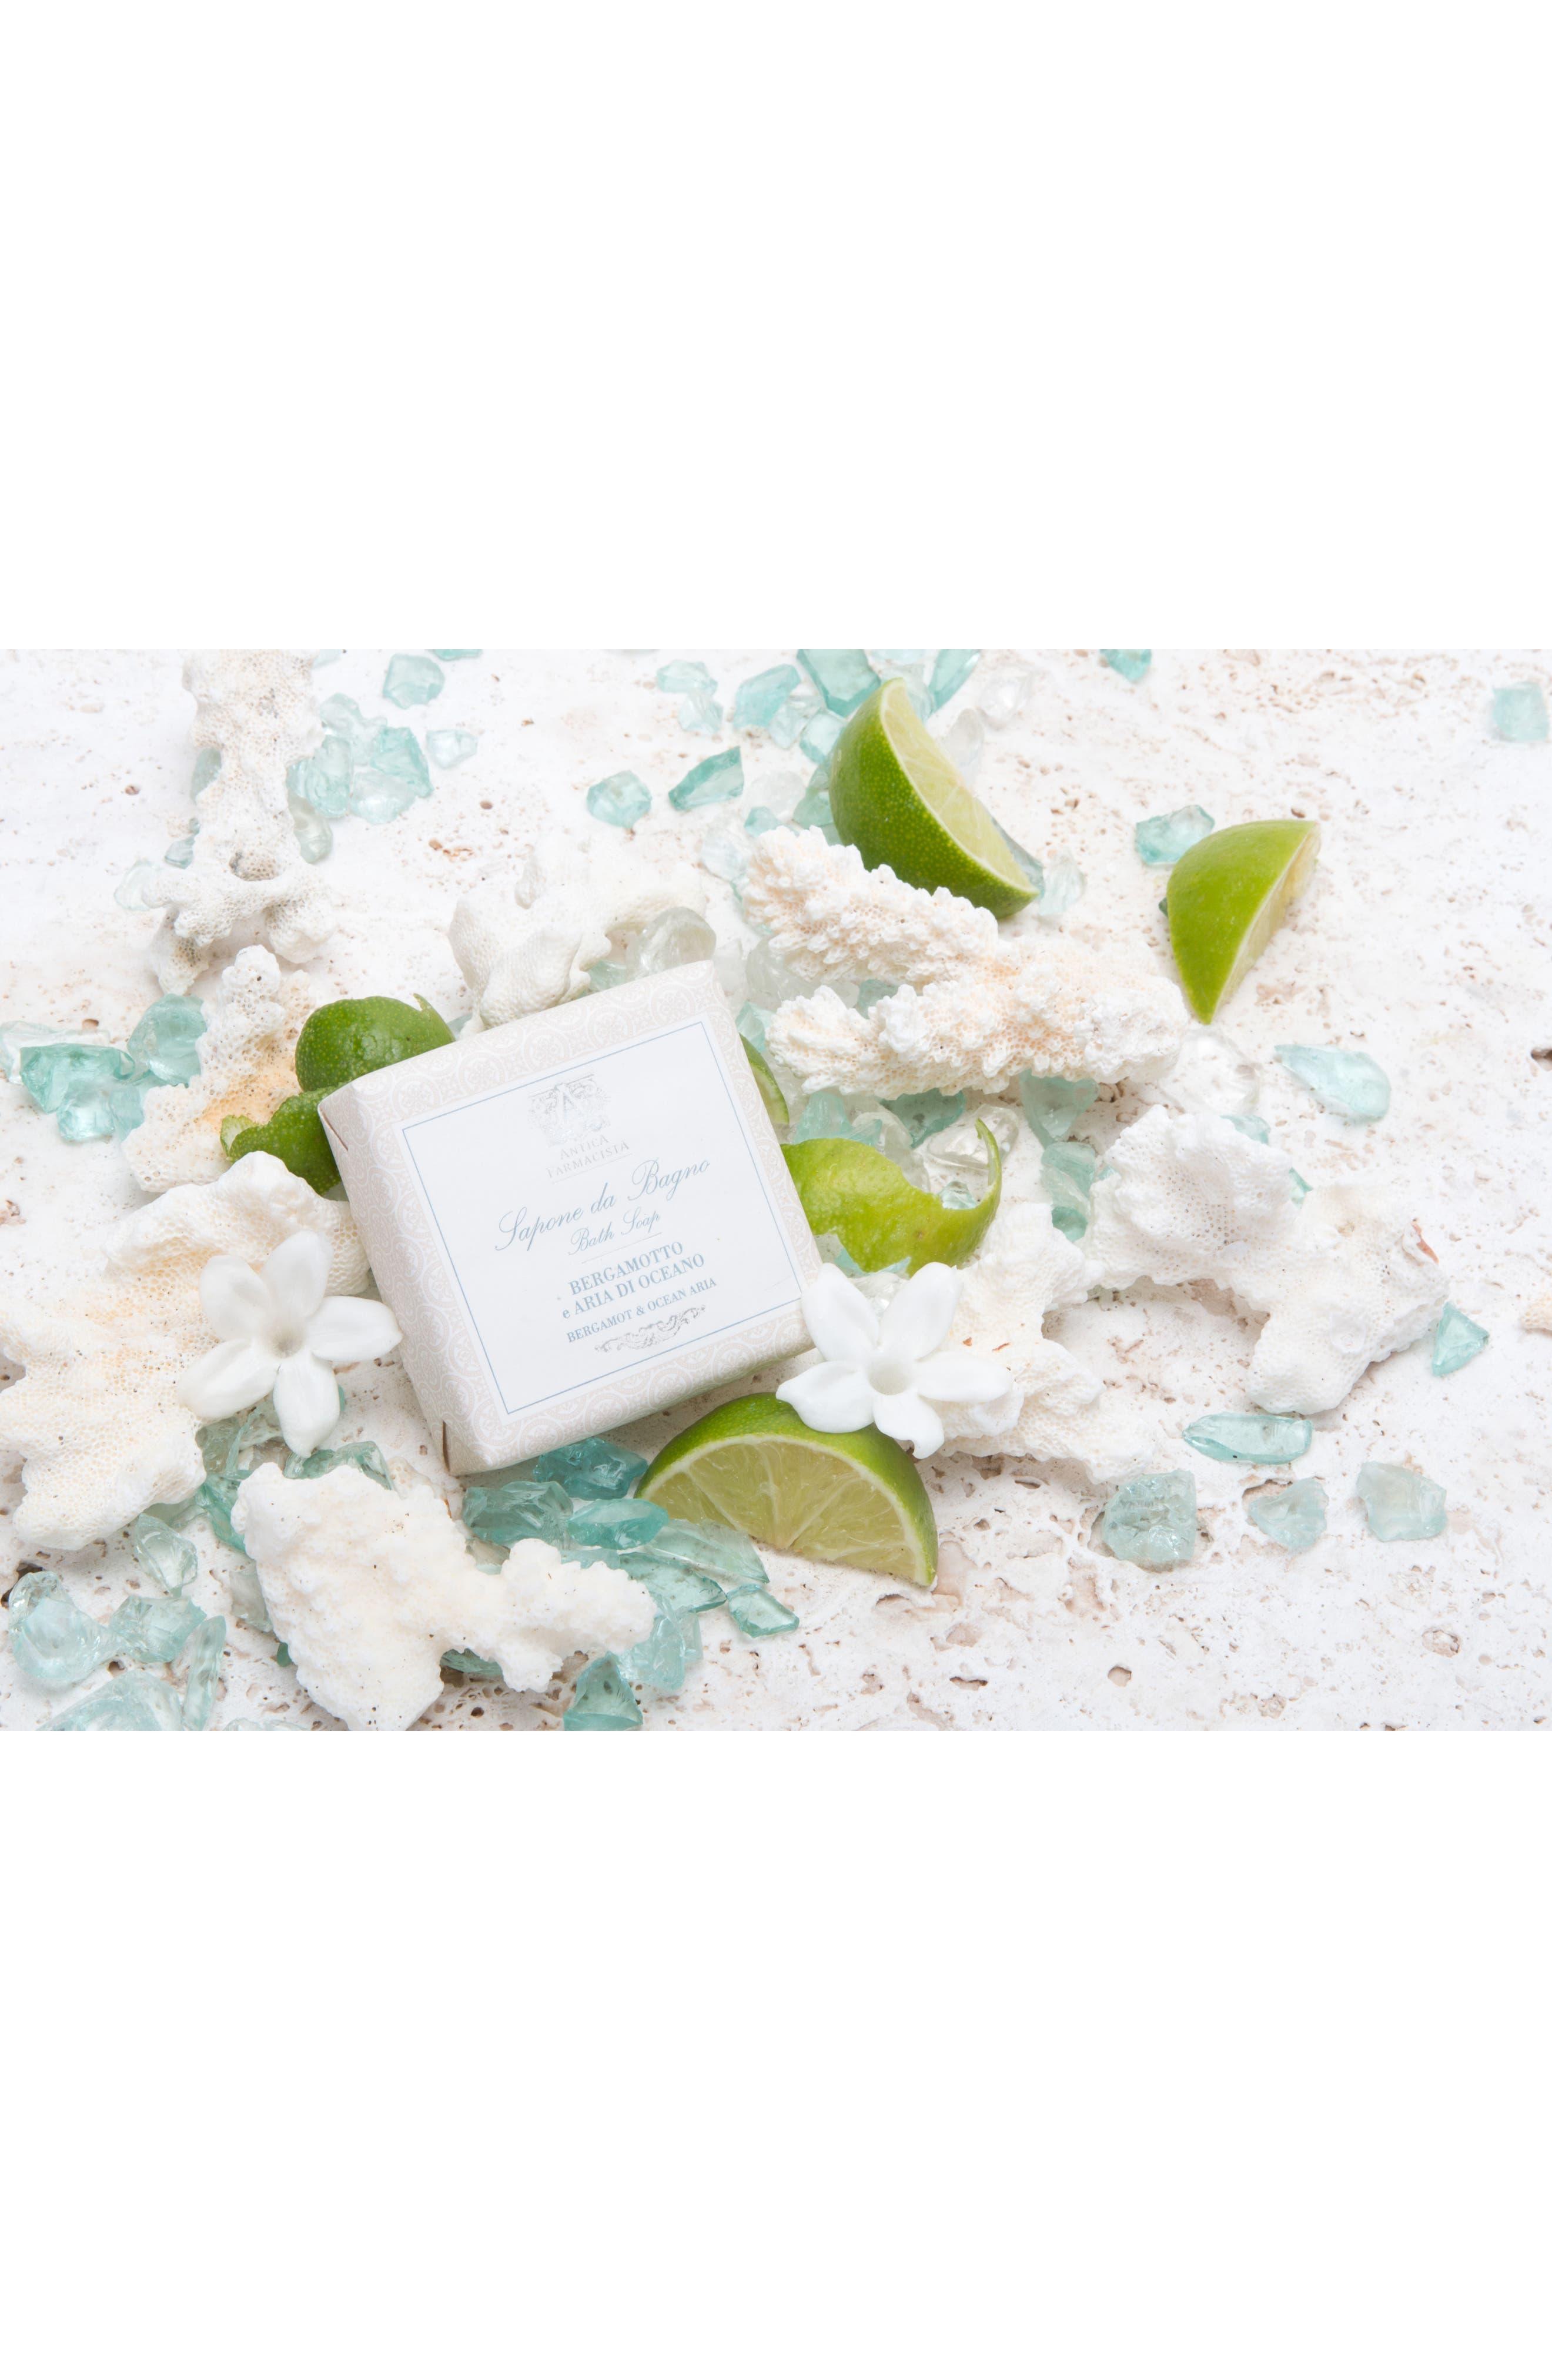 'Bergamot & Ocean Aria' Bar Soap,                             Alternate thumbnail 7, color,                             000